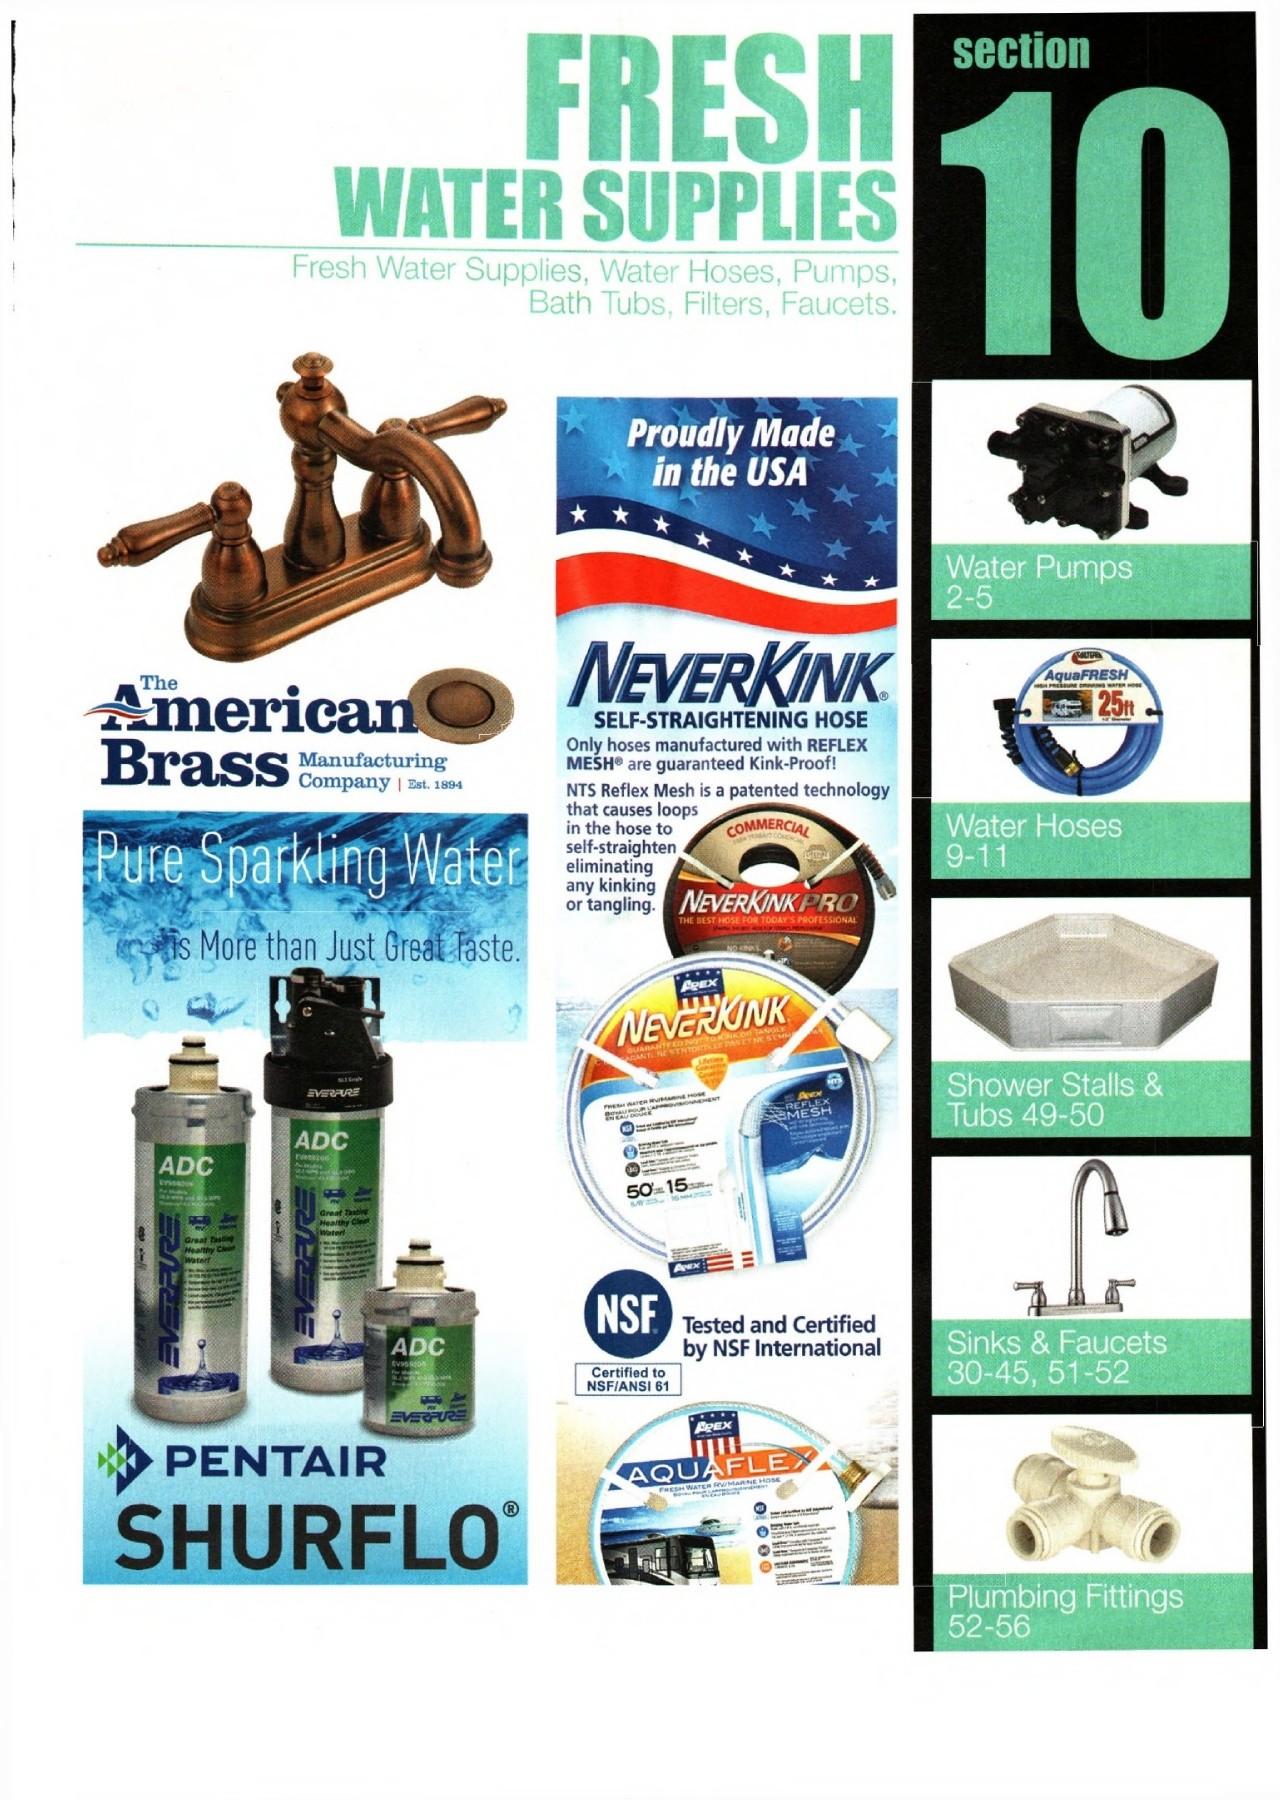 10 Fresh water supplies